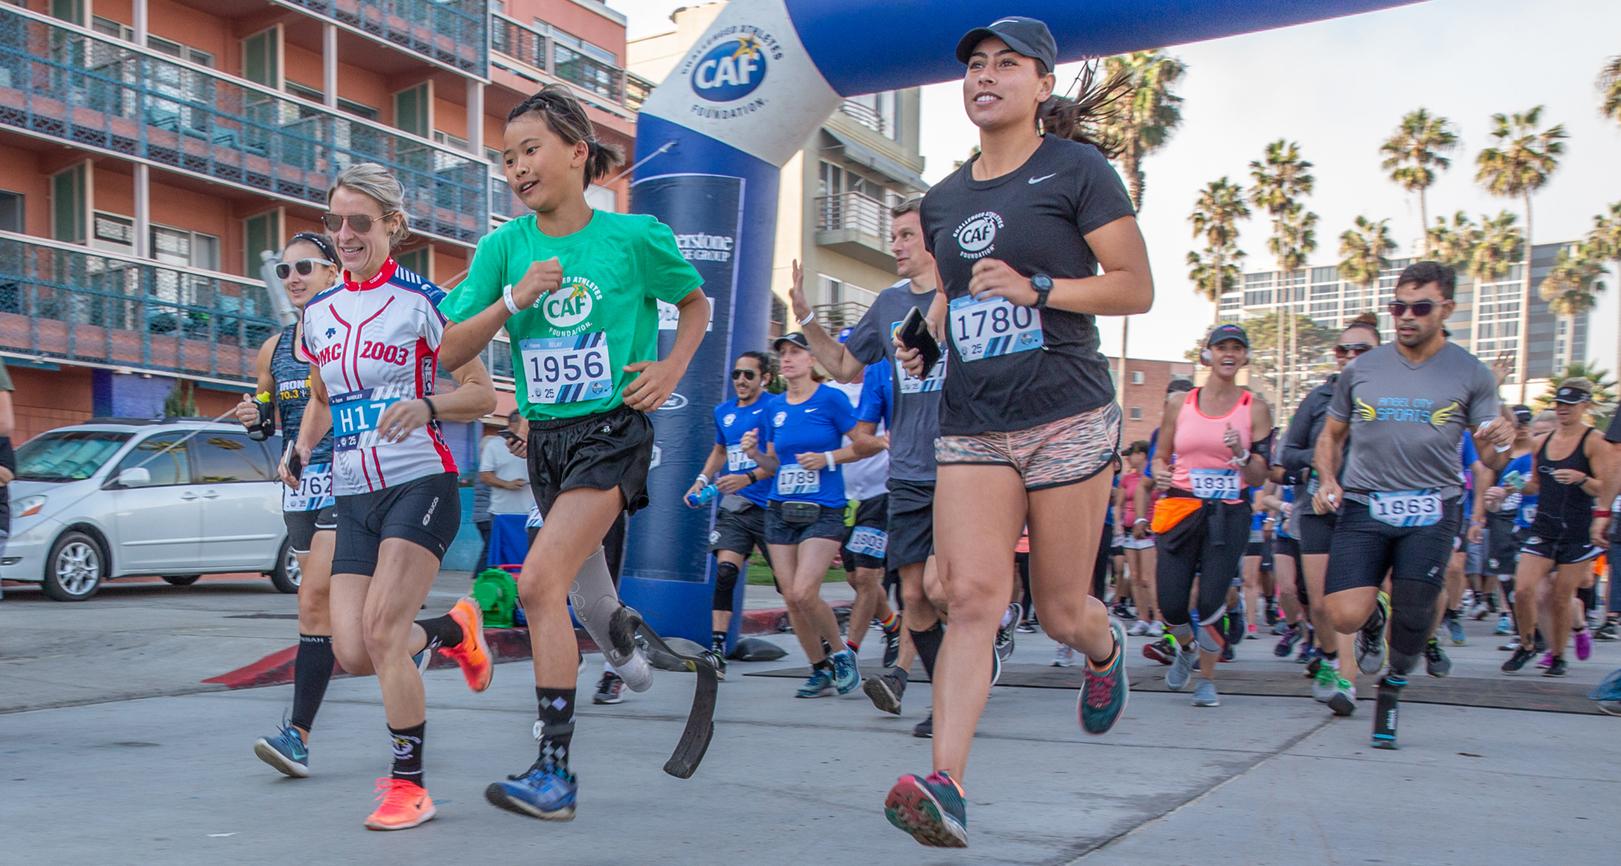 Runners at the 2018 San Diego Triathlon Challenge